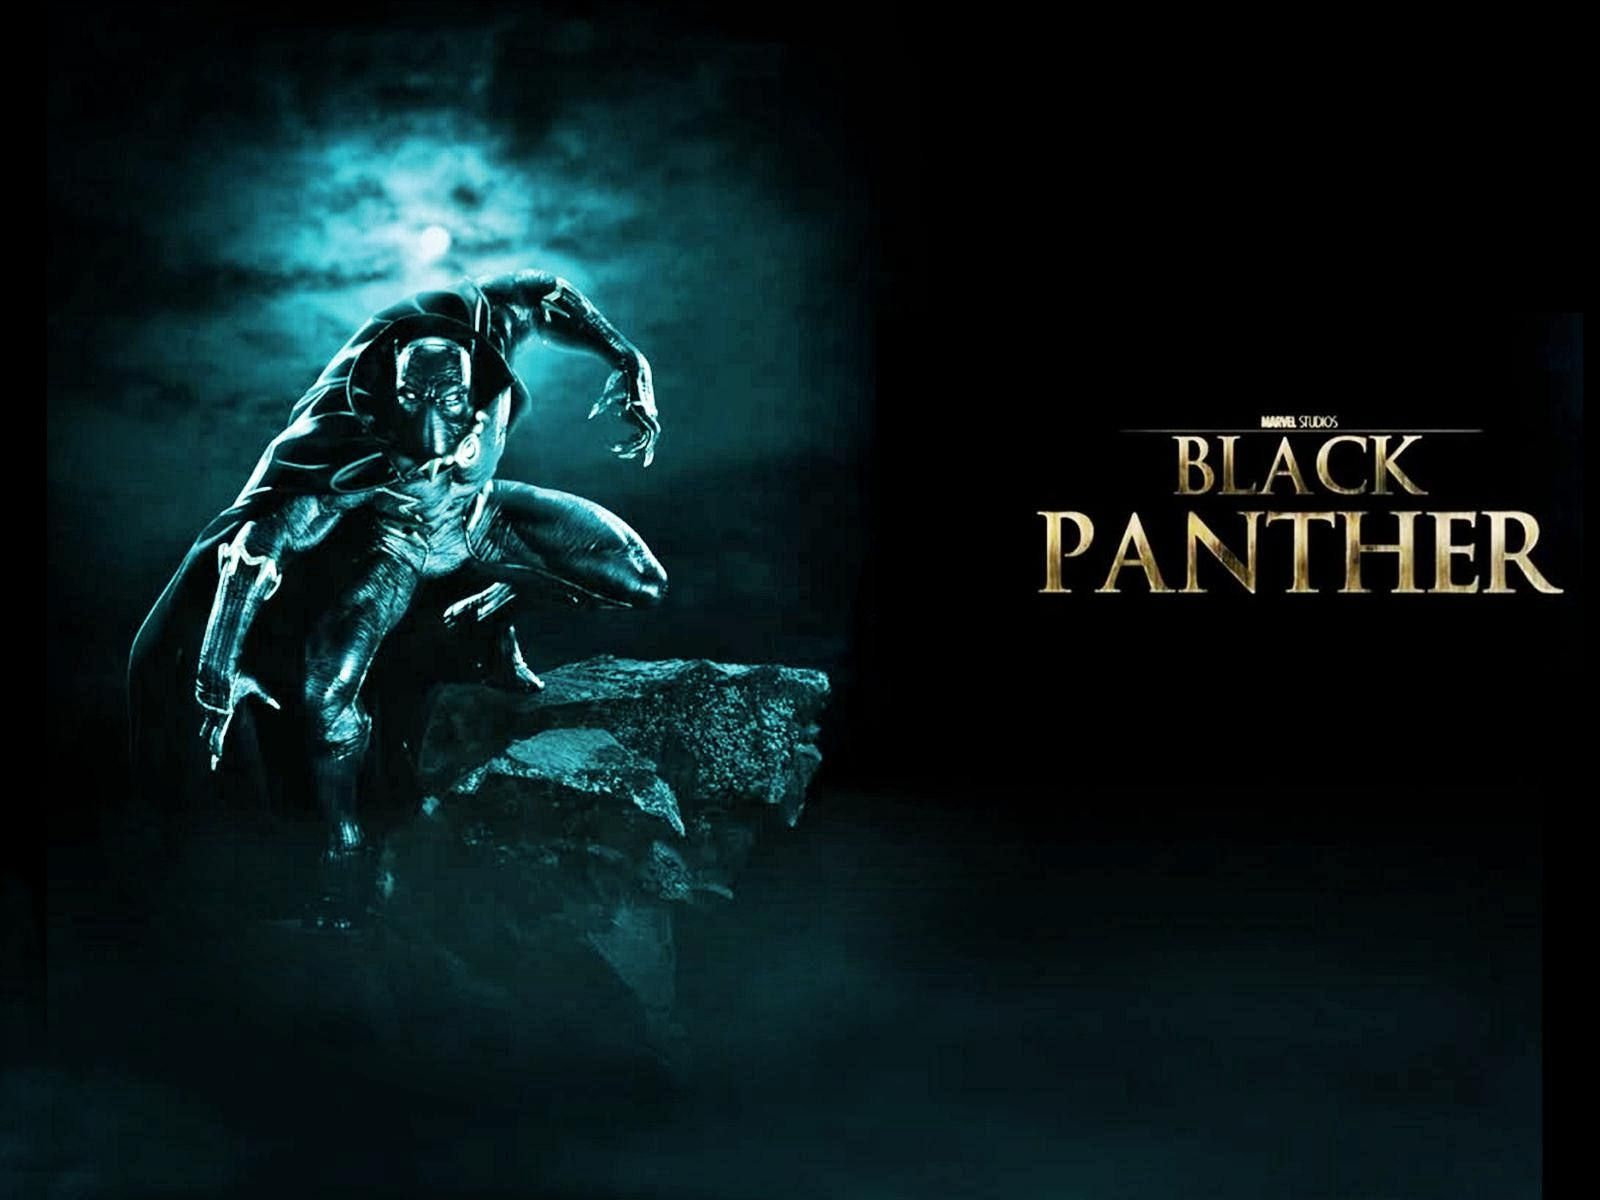 Full Hd P Panther Wallpapers Hd Desktop Backgrounds 1920 1080 Panther Wallpapers 46 Wallpapers Ado Black Panther Black Panther Marvel Hd Wallpapers 1080p